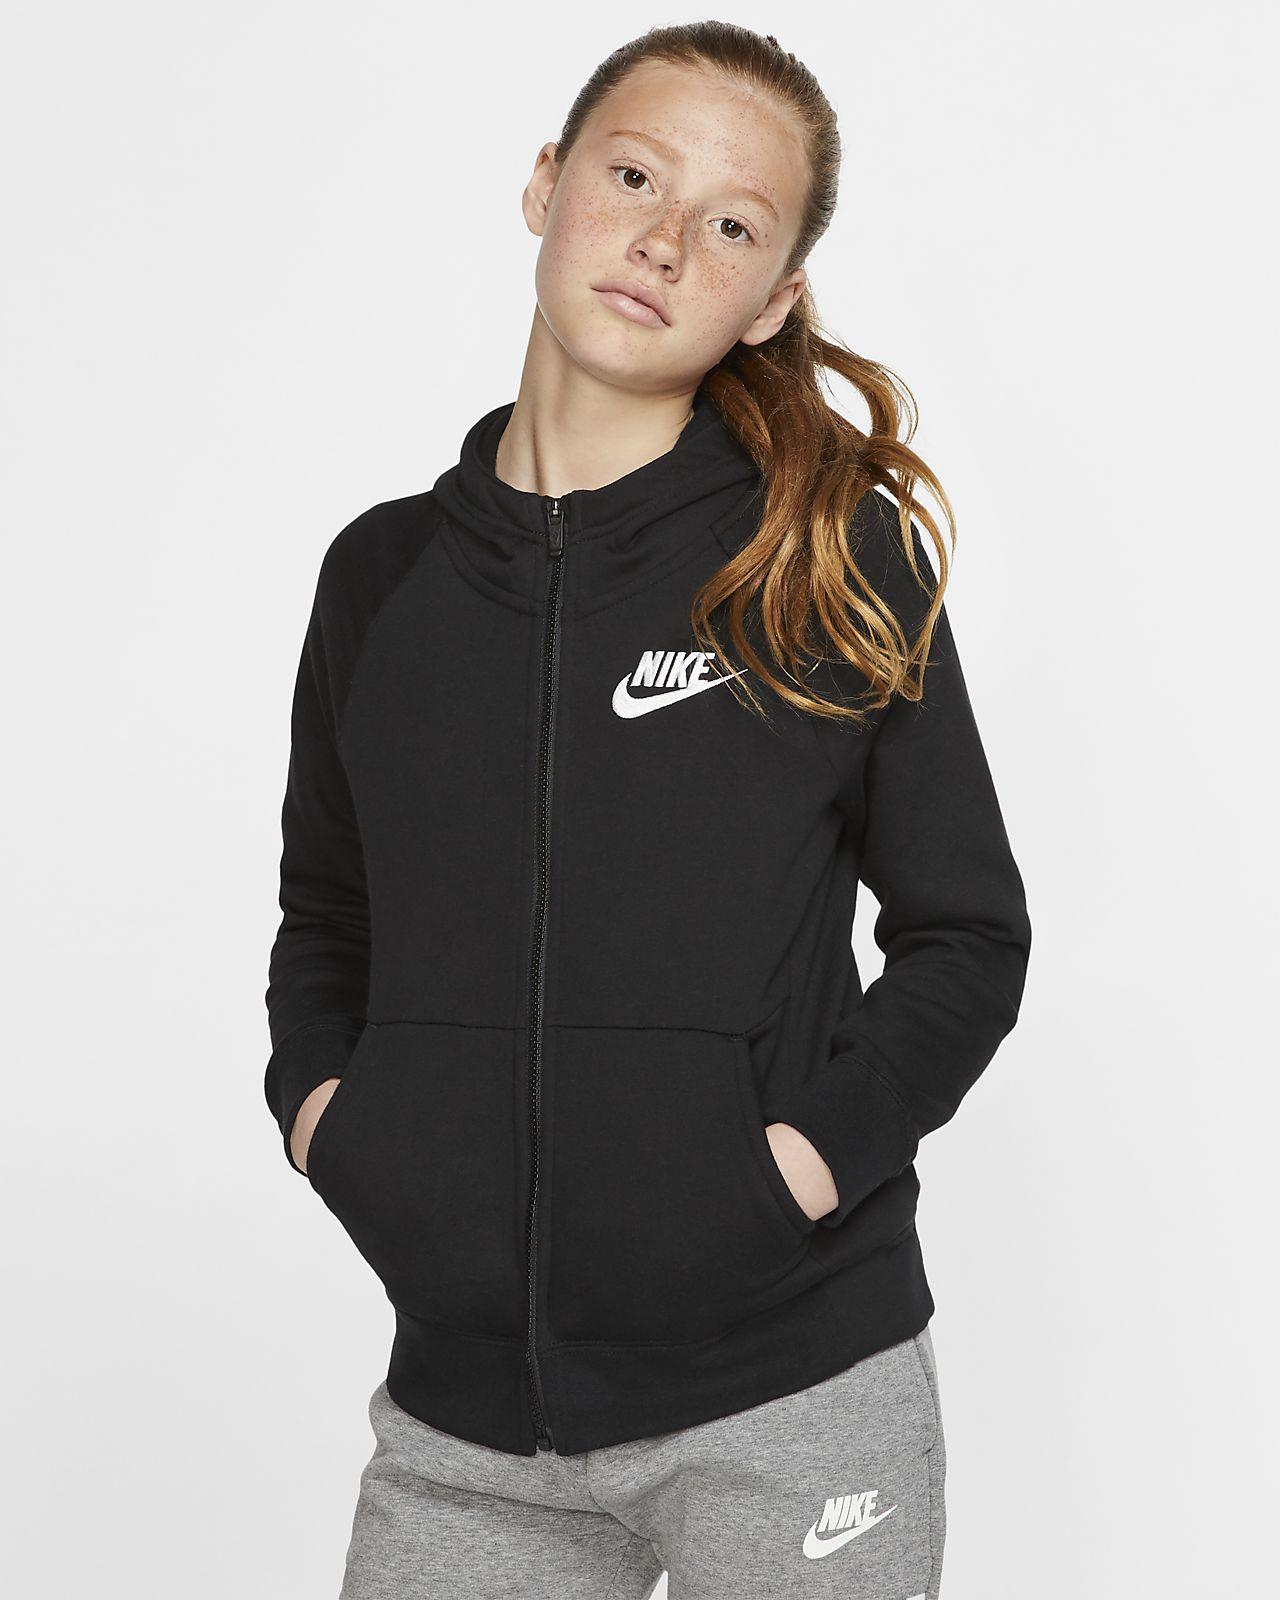 Nike Sportswear Girls\u0027 Full,Zip Hoodie